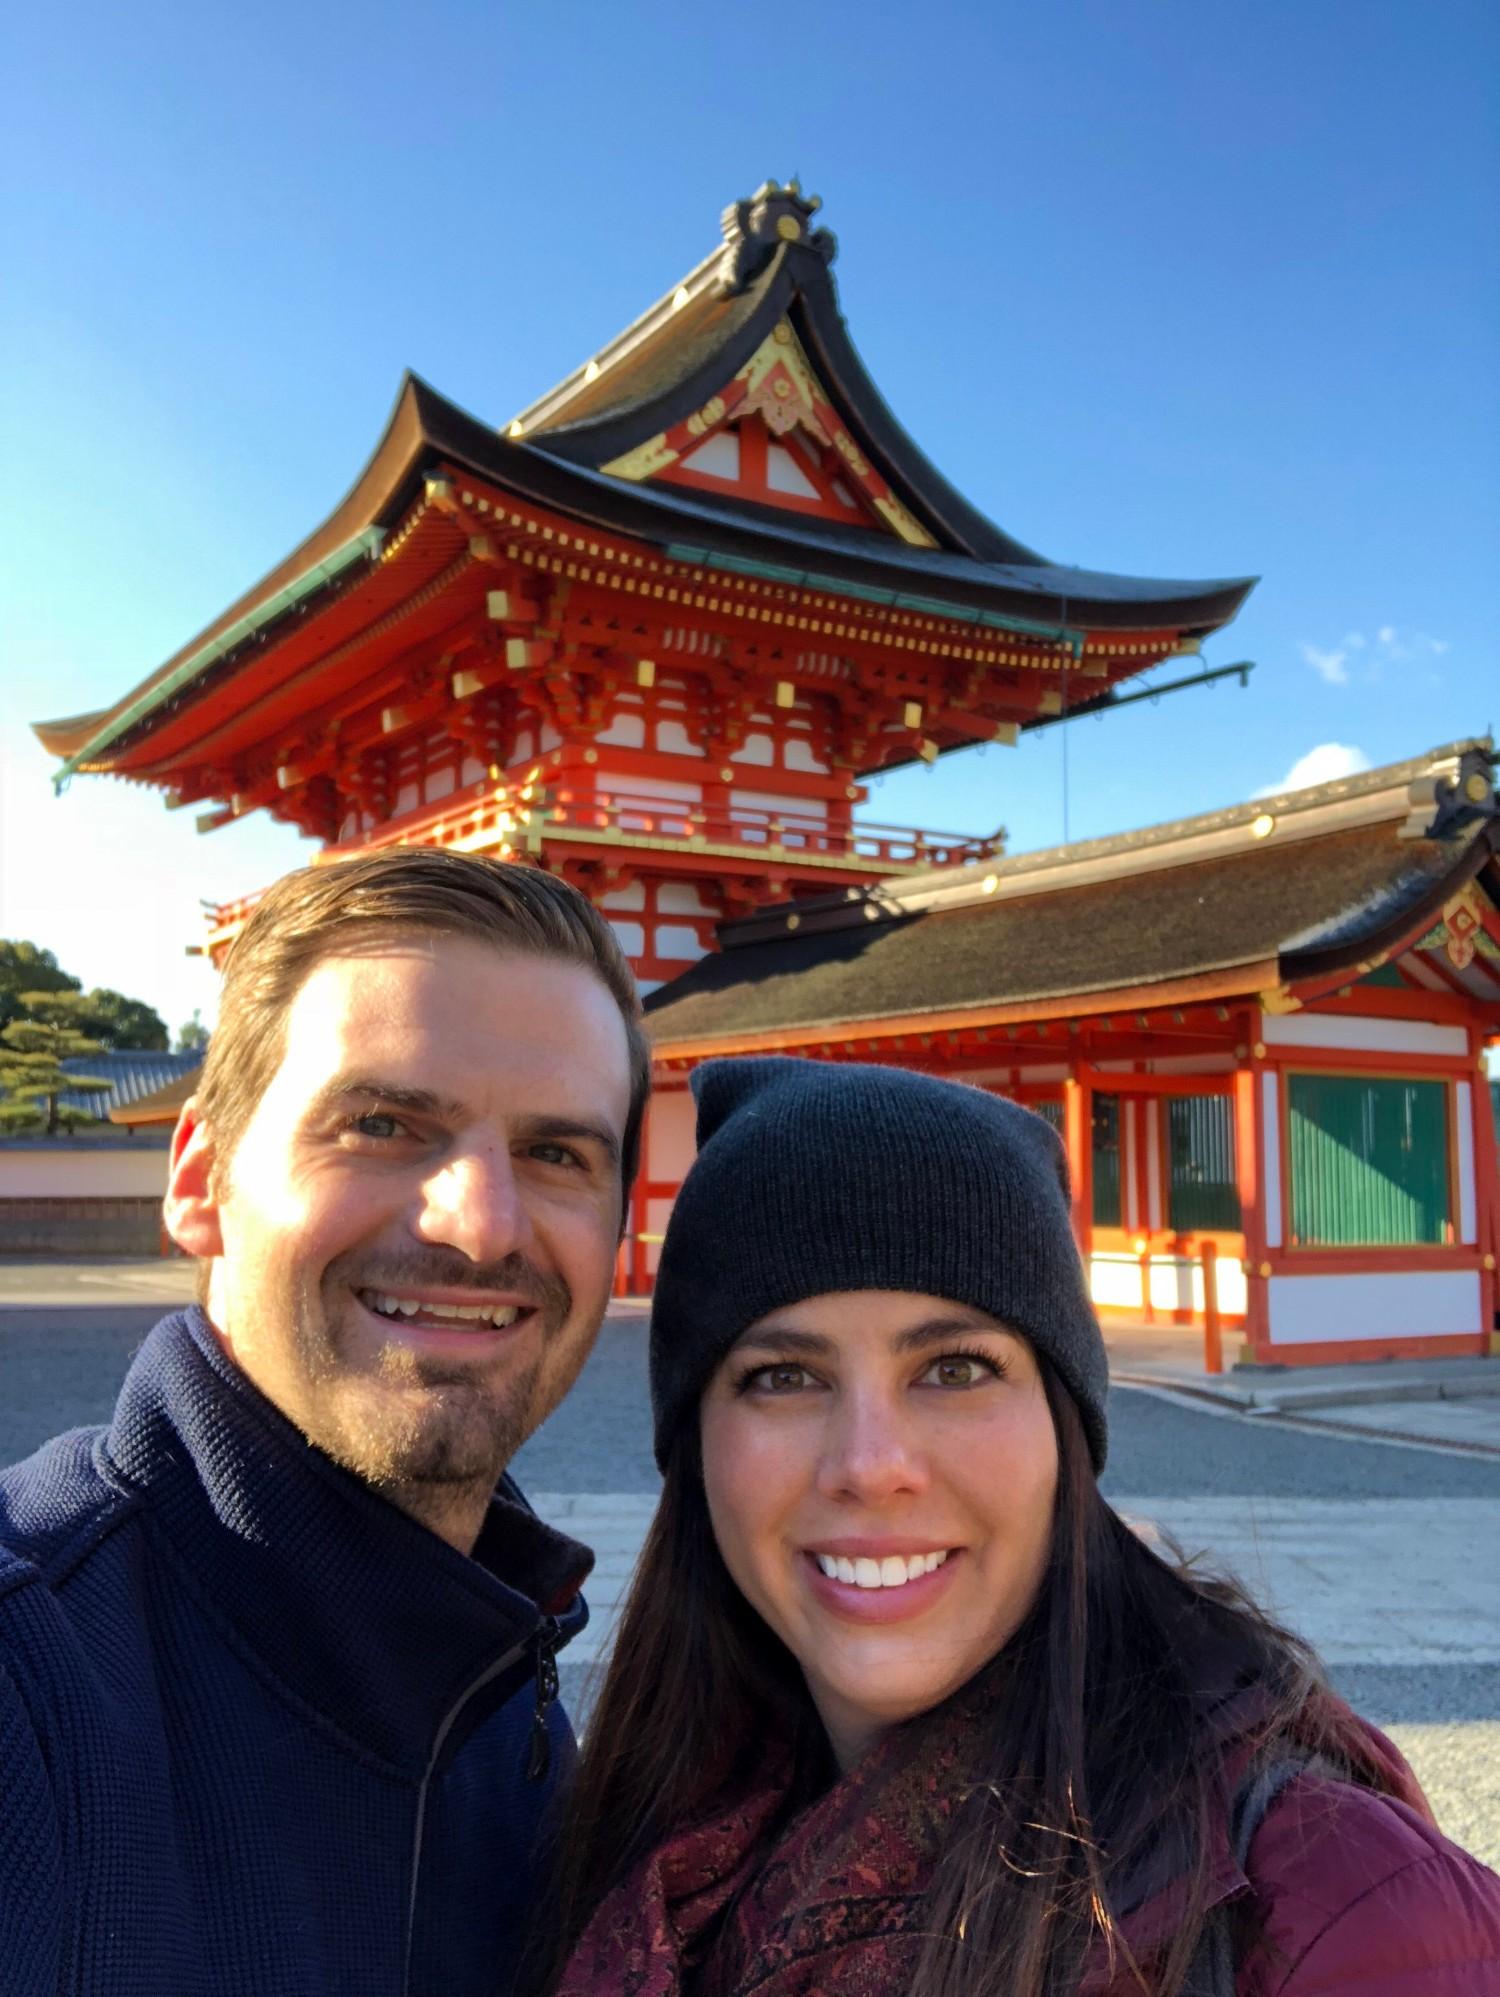 Matt and Kelly start out their early morning at the entrance to the Fushimi Inari-Taisha Shrine in Kyoto, Japan.